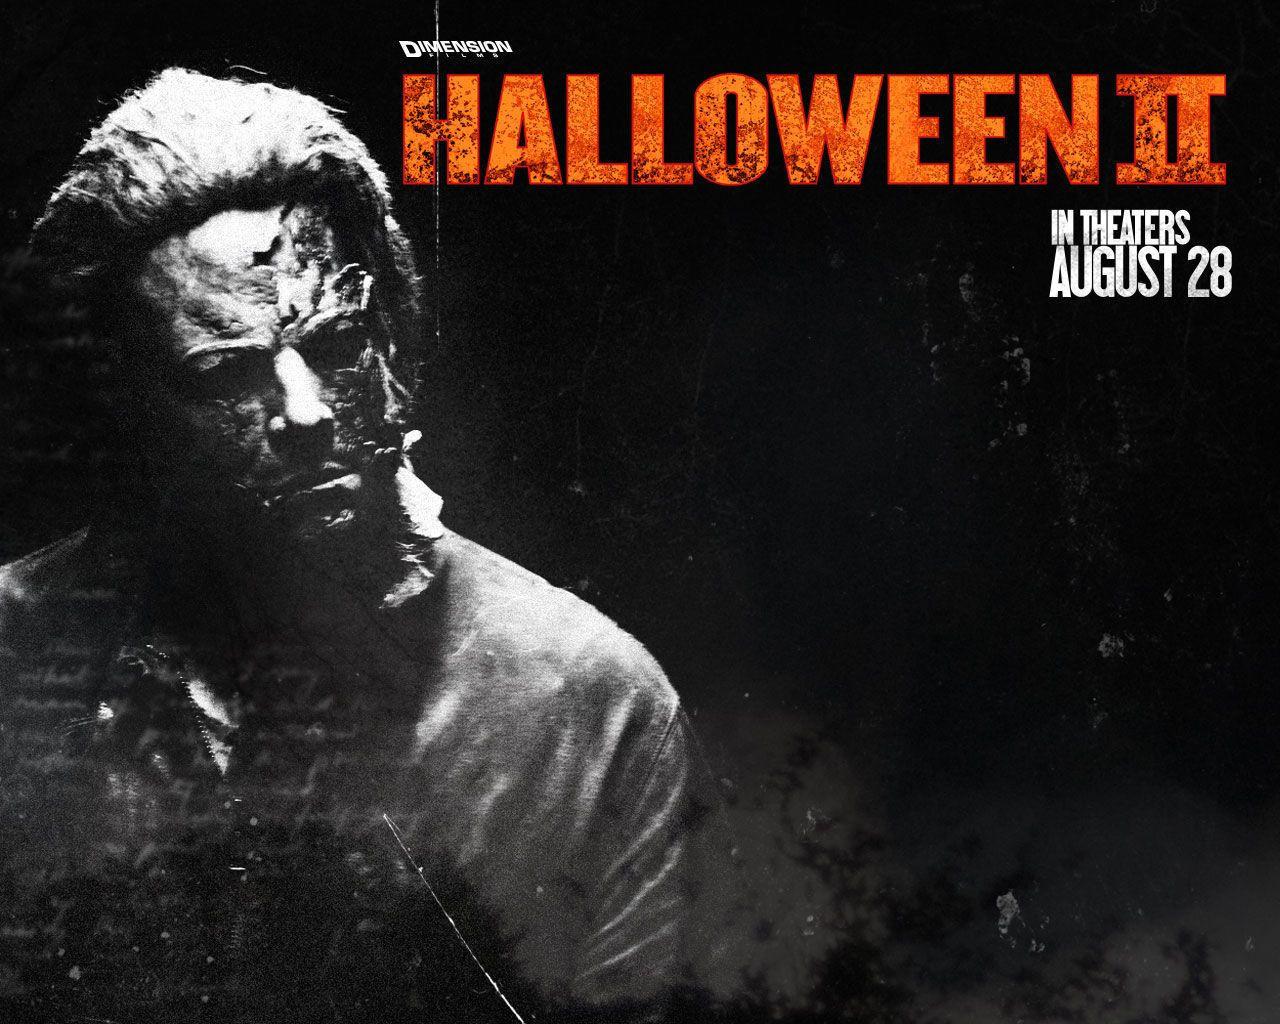 Halloween 2 Wallpapers Group 76 1280x1024